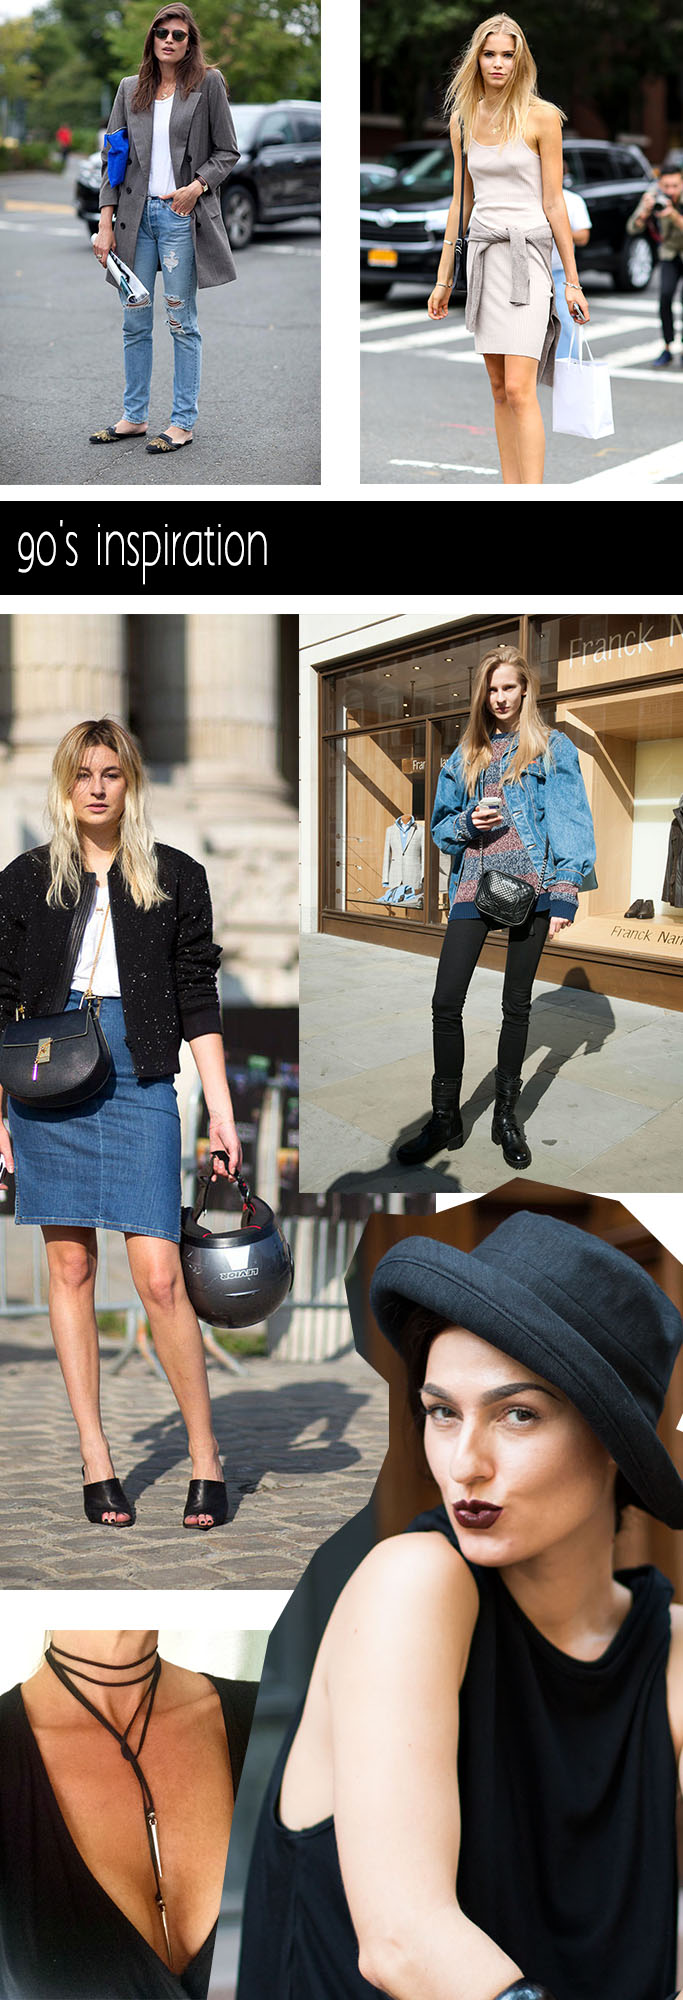 Moda - 90's Street Style - 90's Inspiration - Blog Paula Martins 3